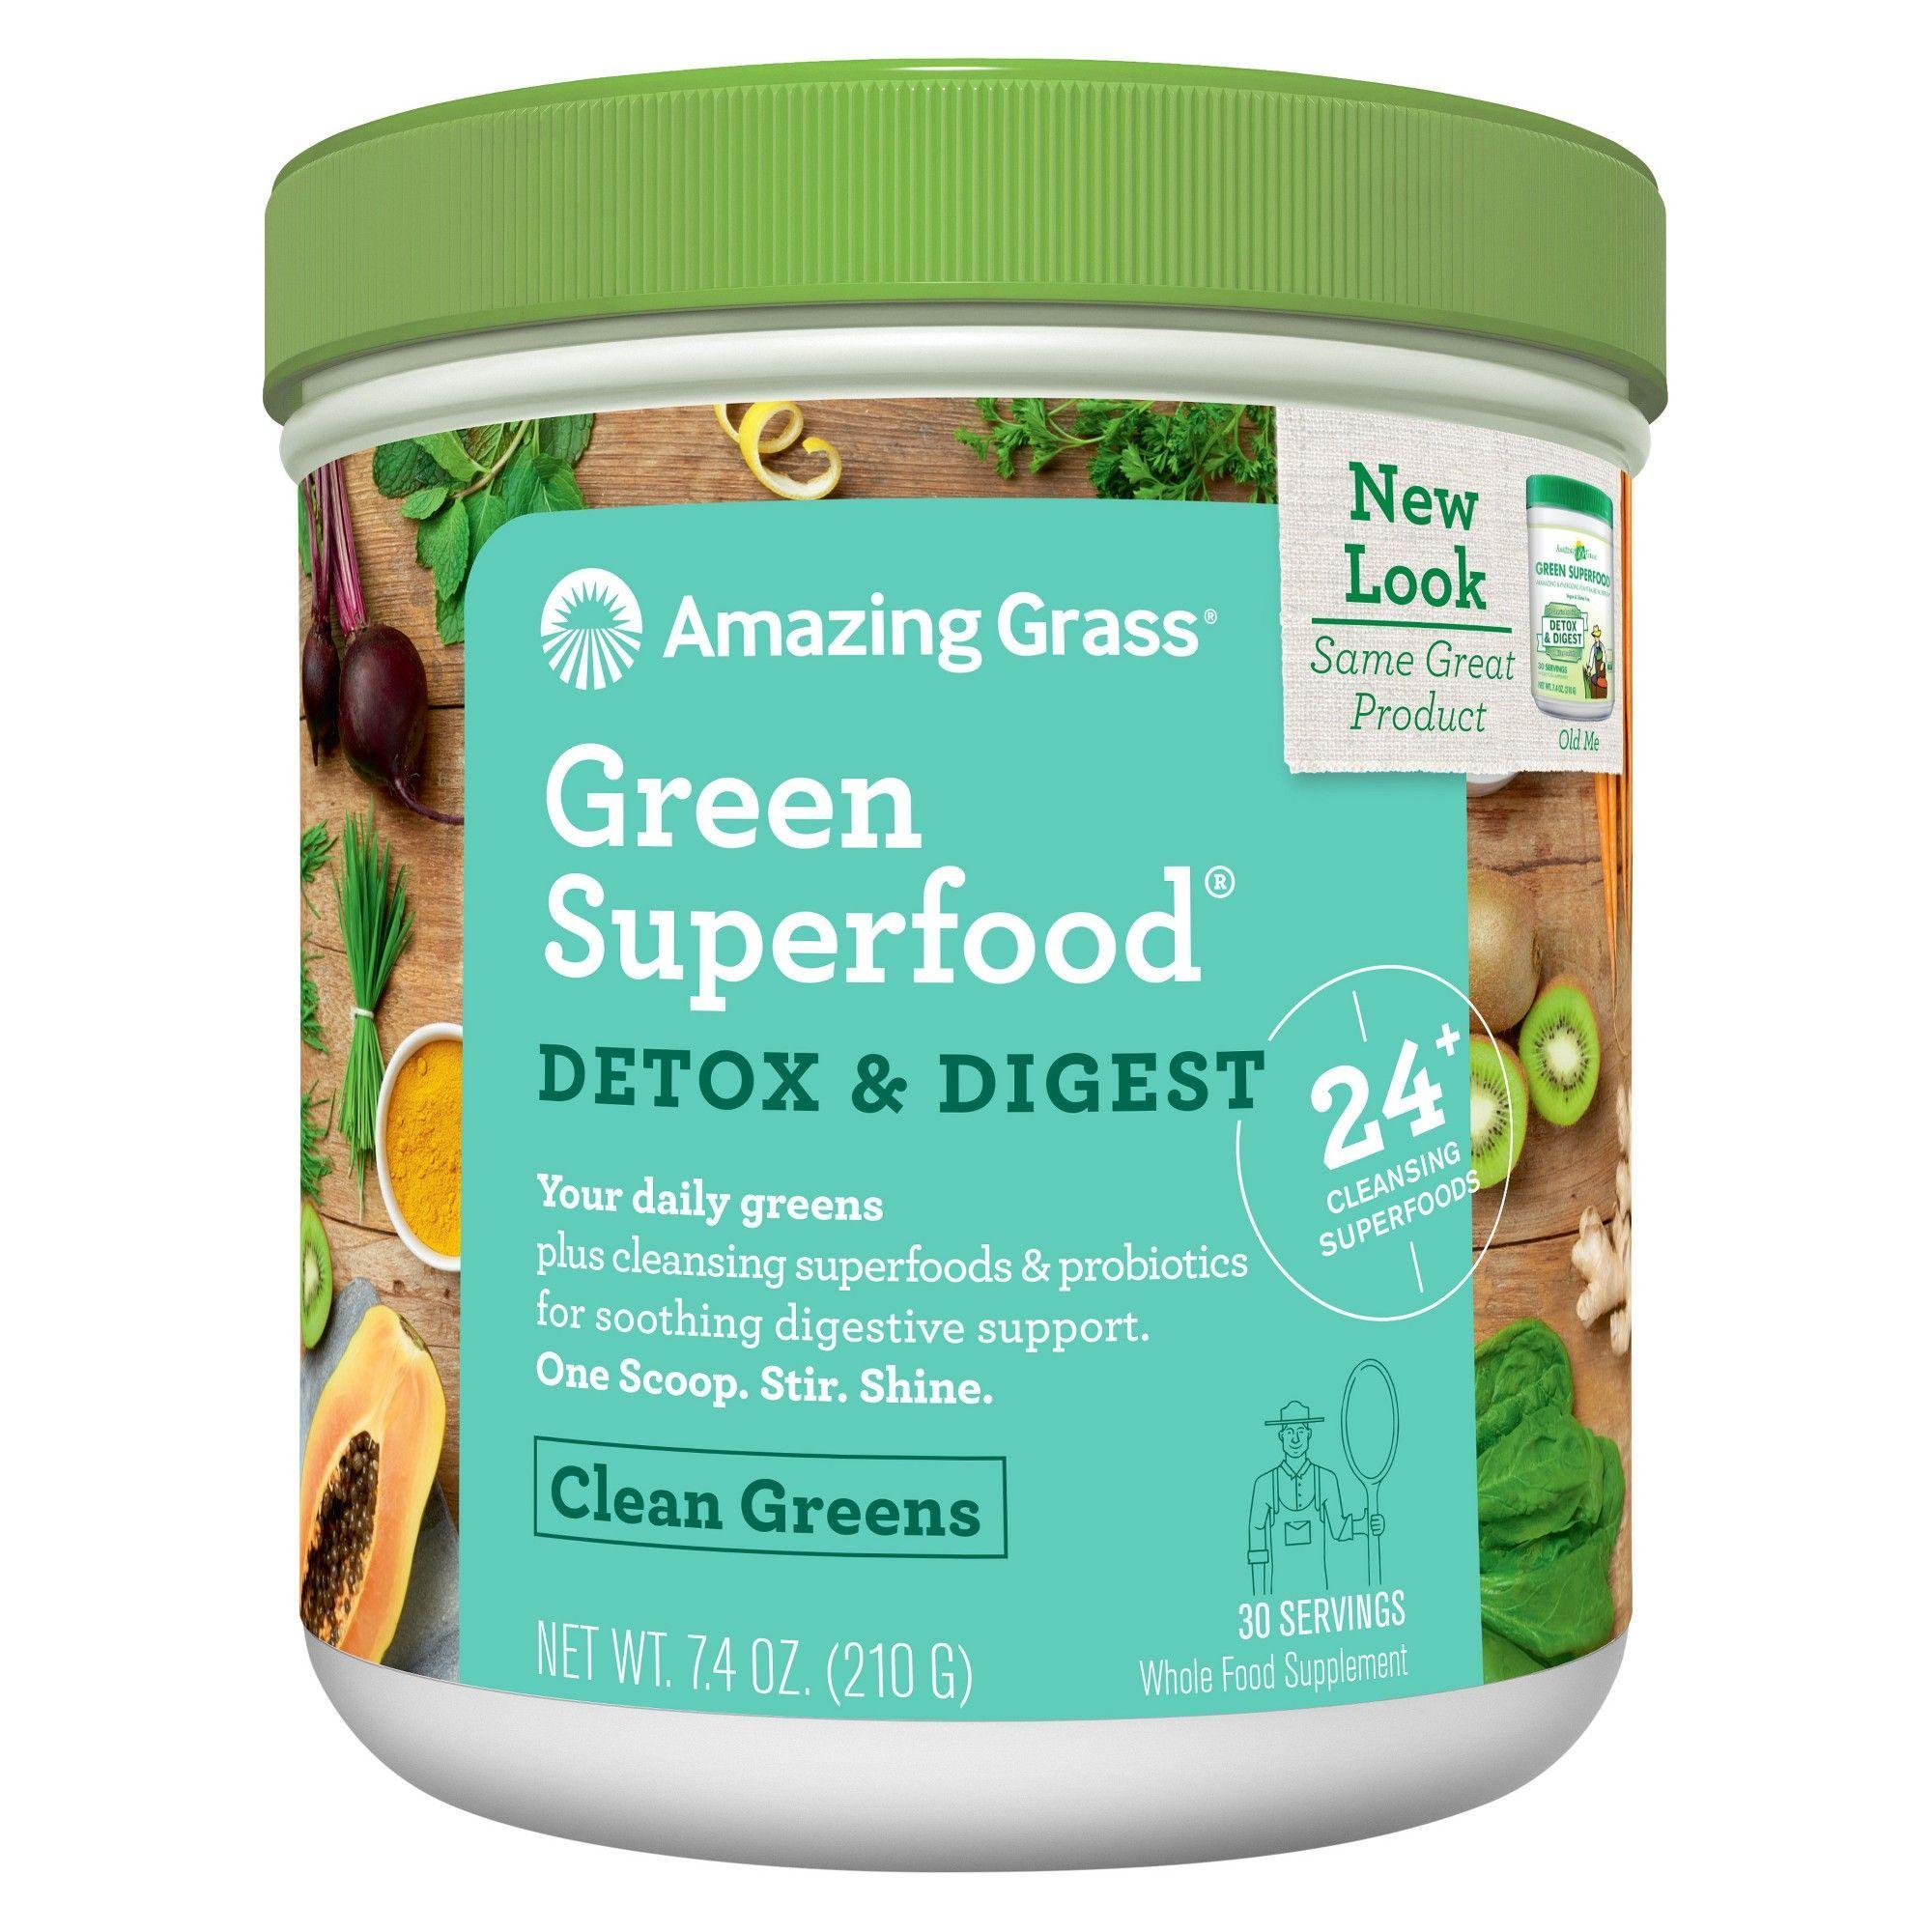 Amazing Grass Green Superfood Detox & Digest - Clean Greens - 7.4oz